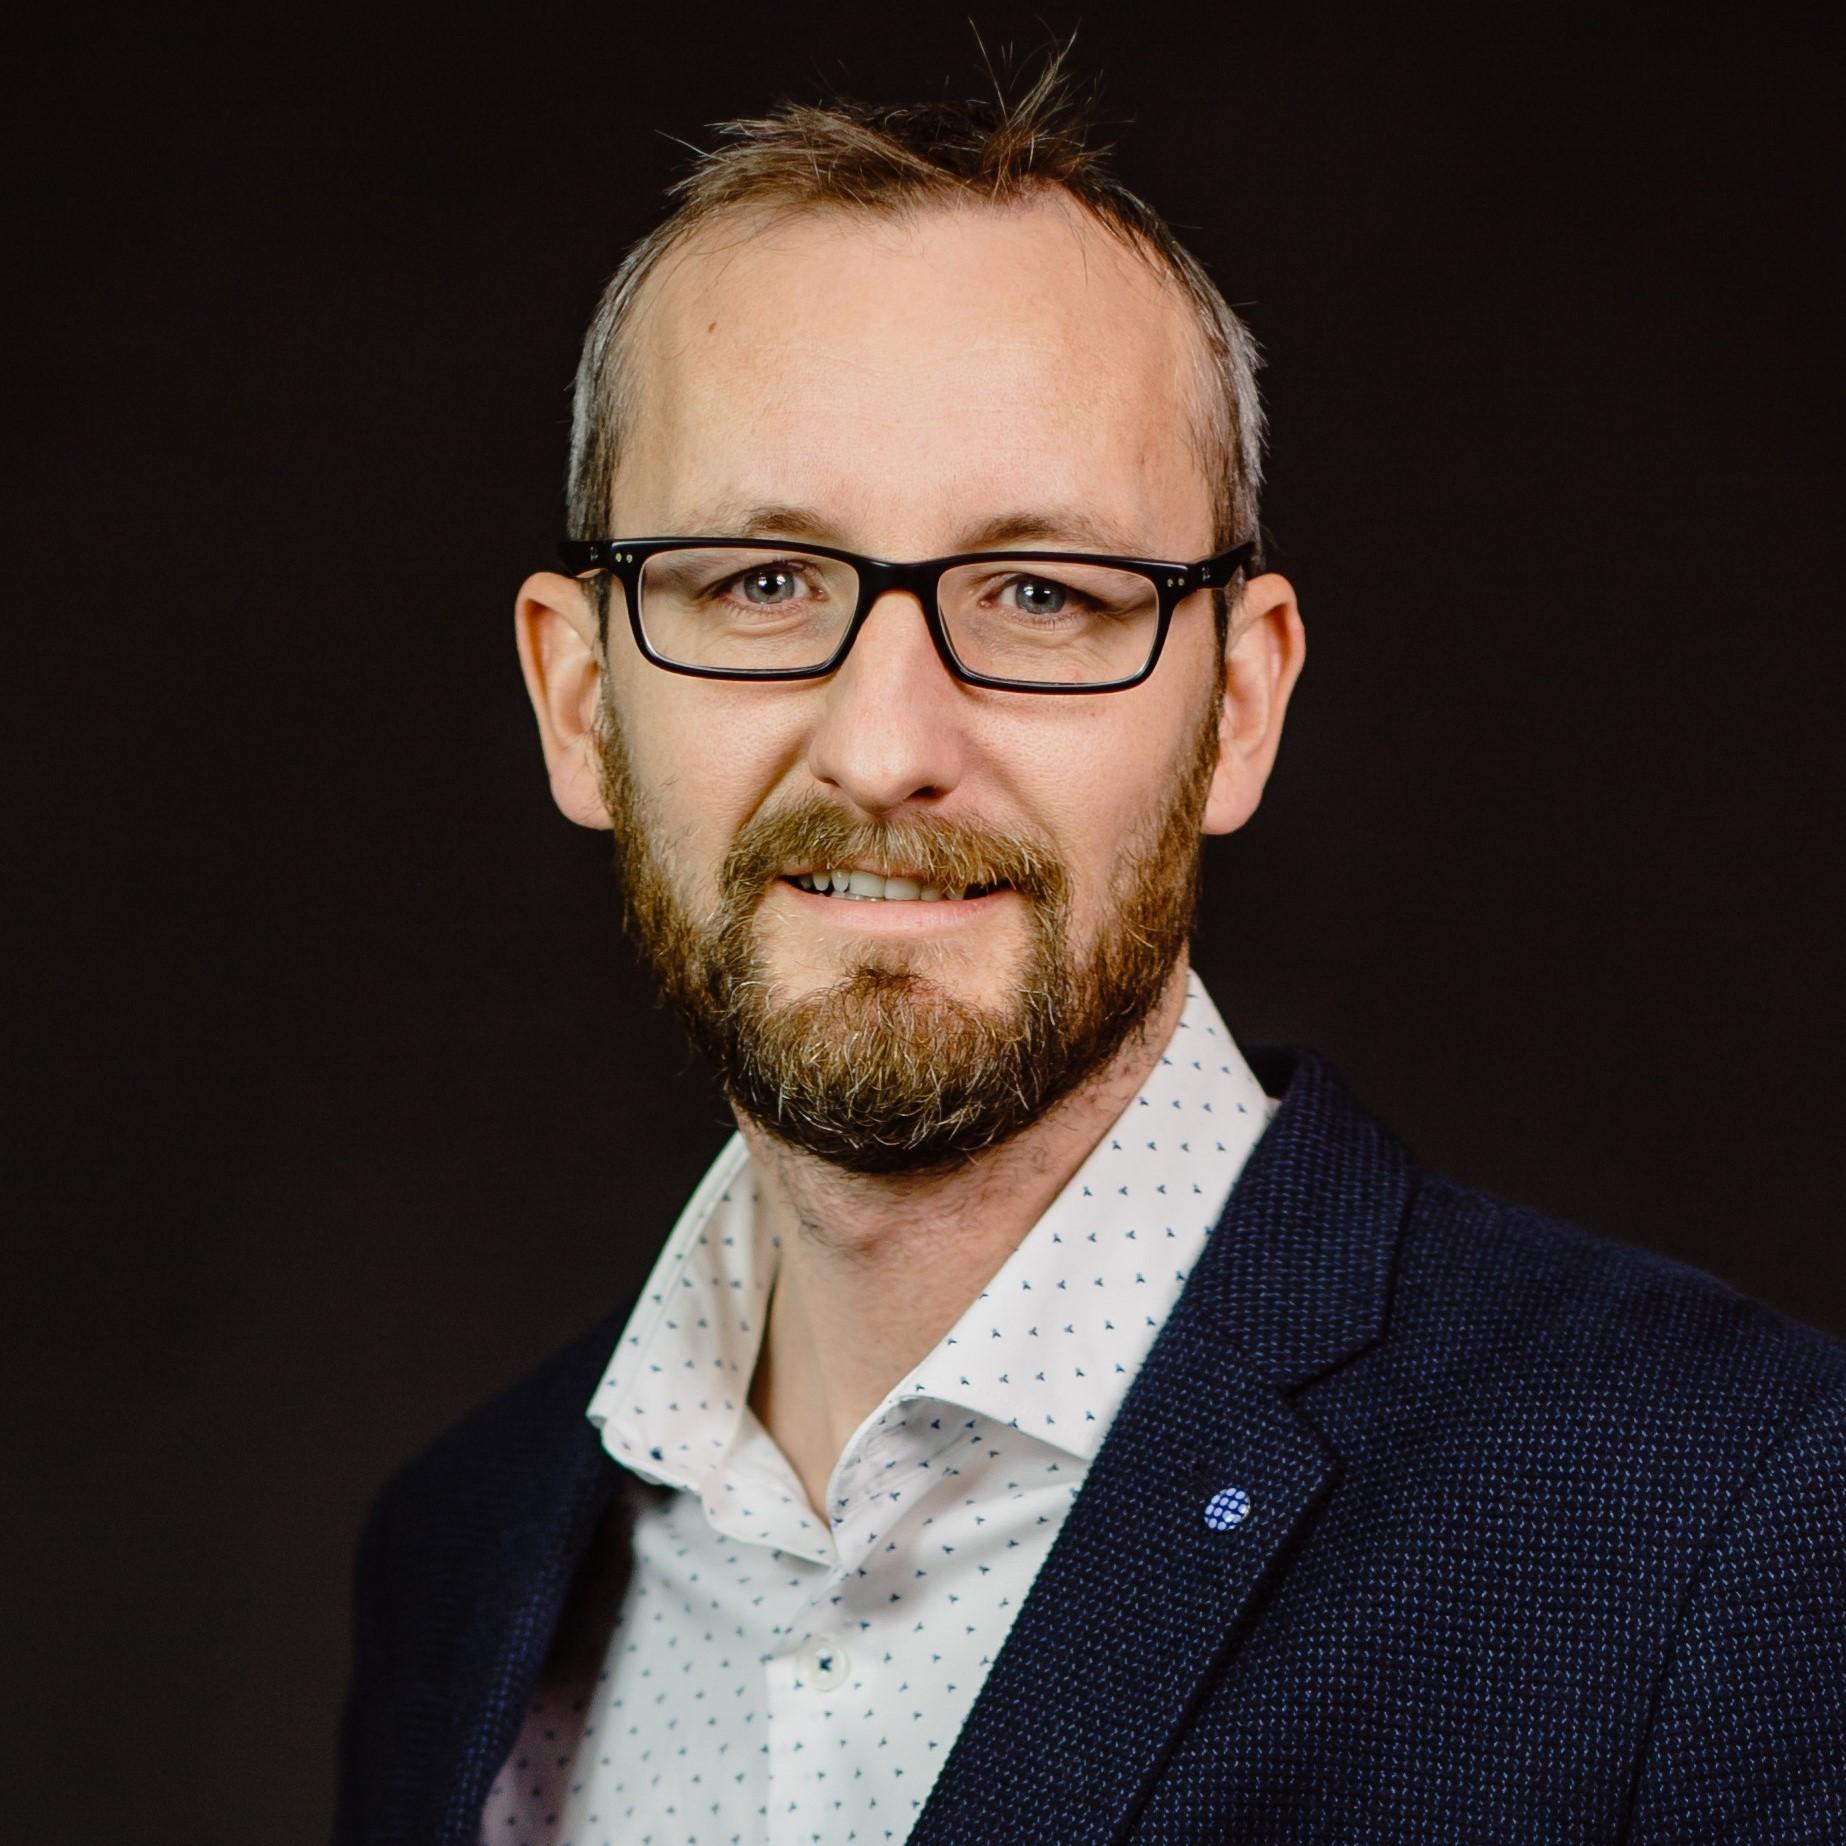 Darren Kilford - Director